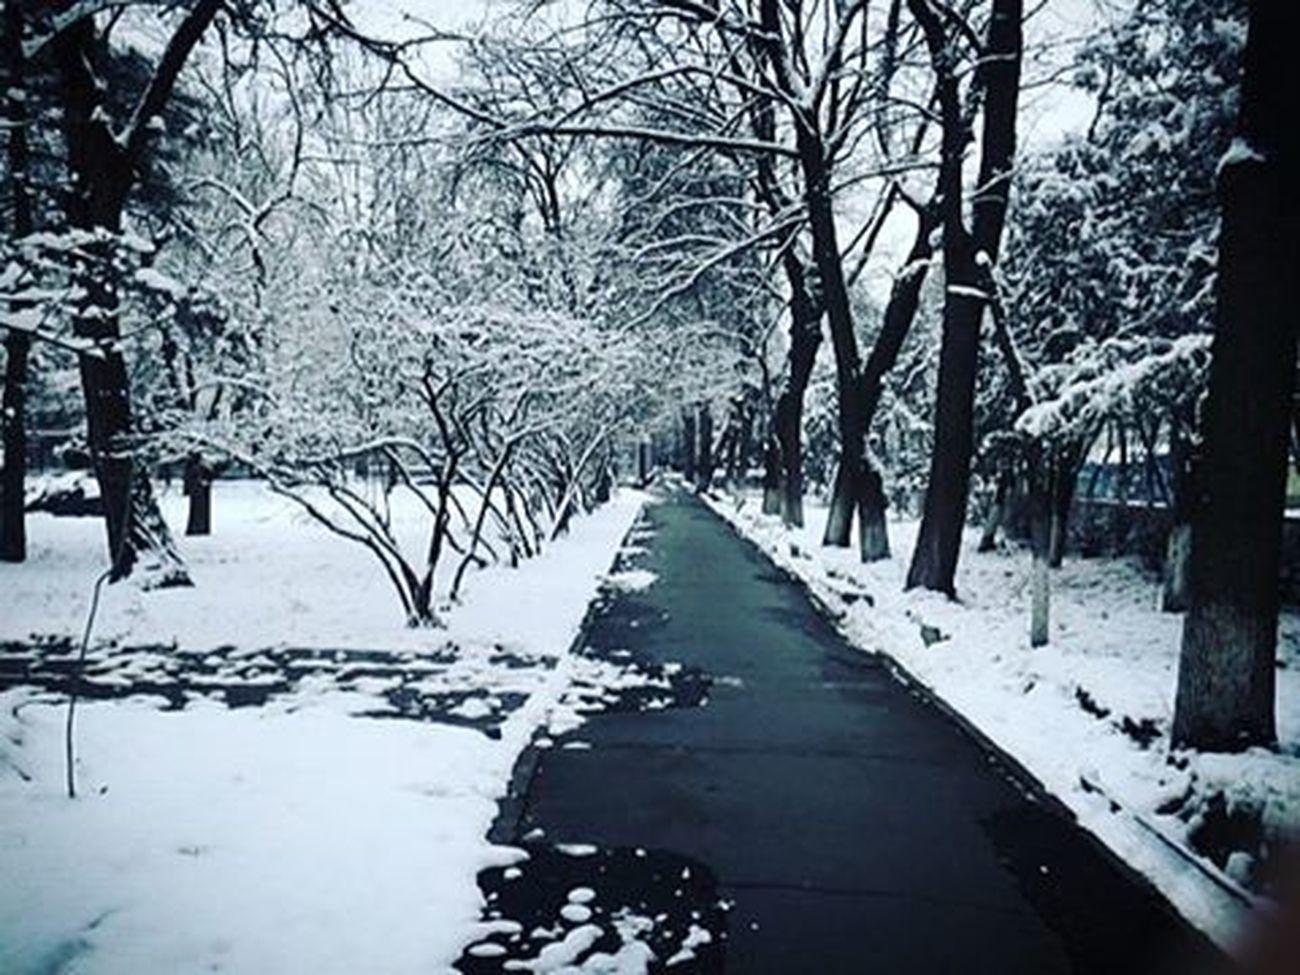 Winter2015 ❄